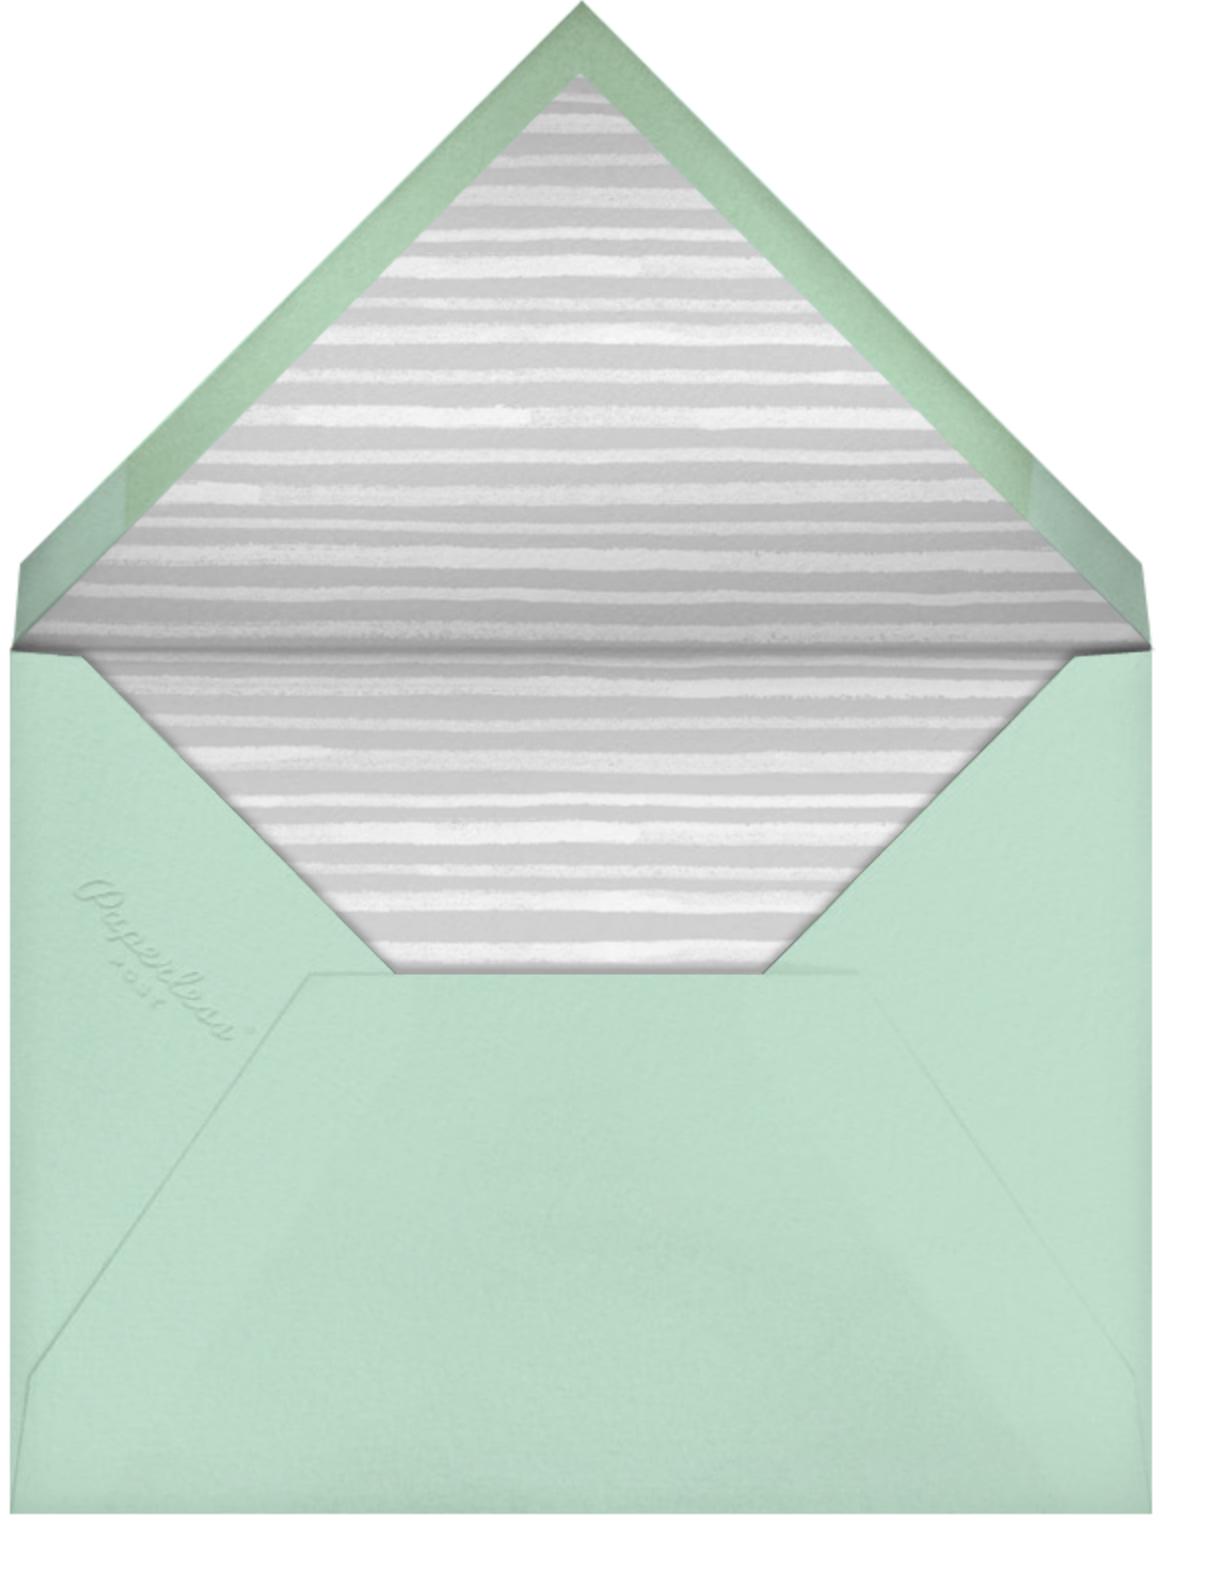 Tropical Palm (Photo Announcement) - Mint - Paperless Post - Envelope